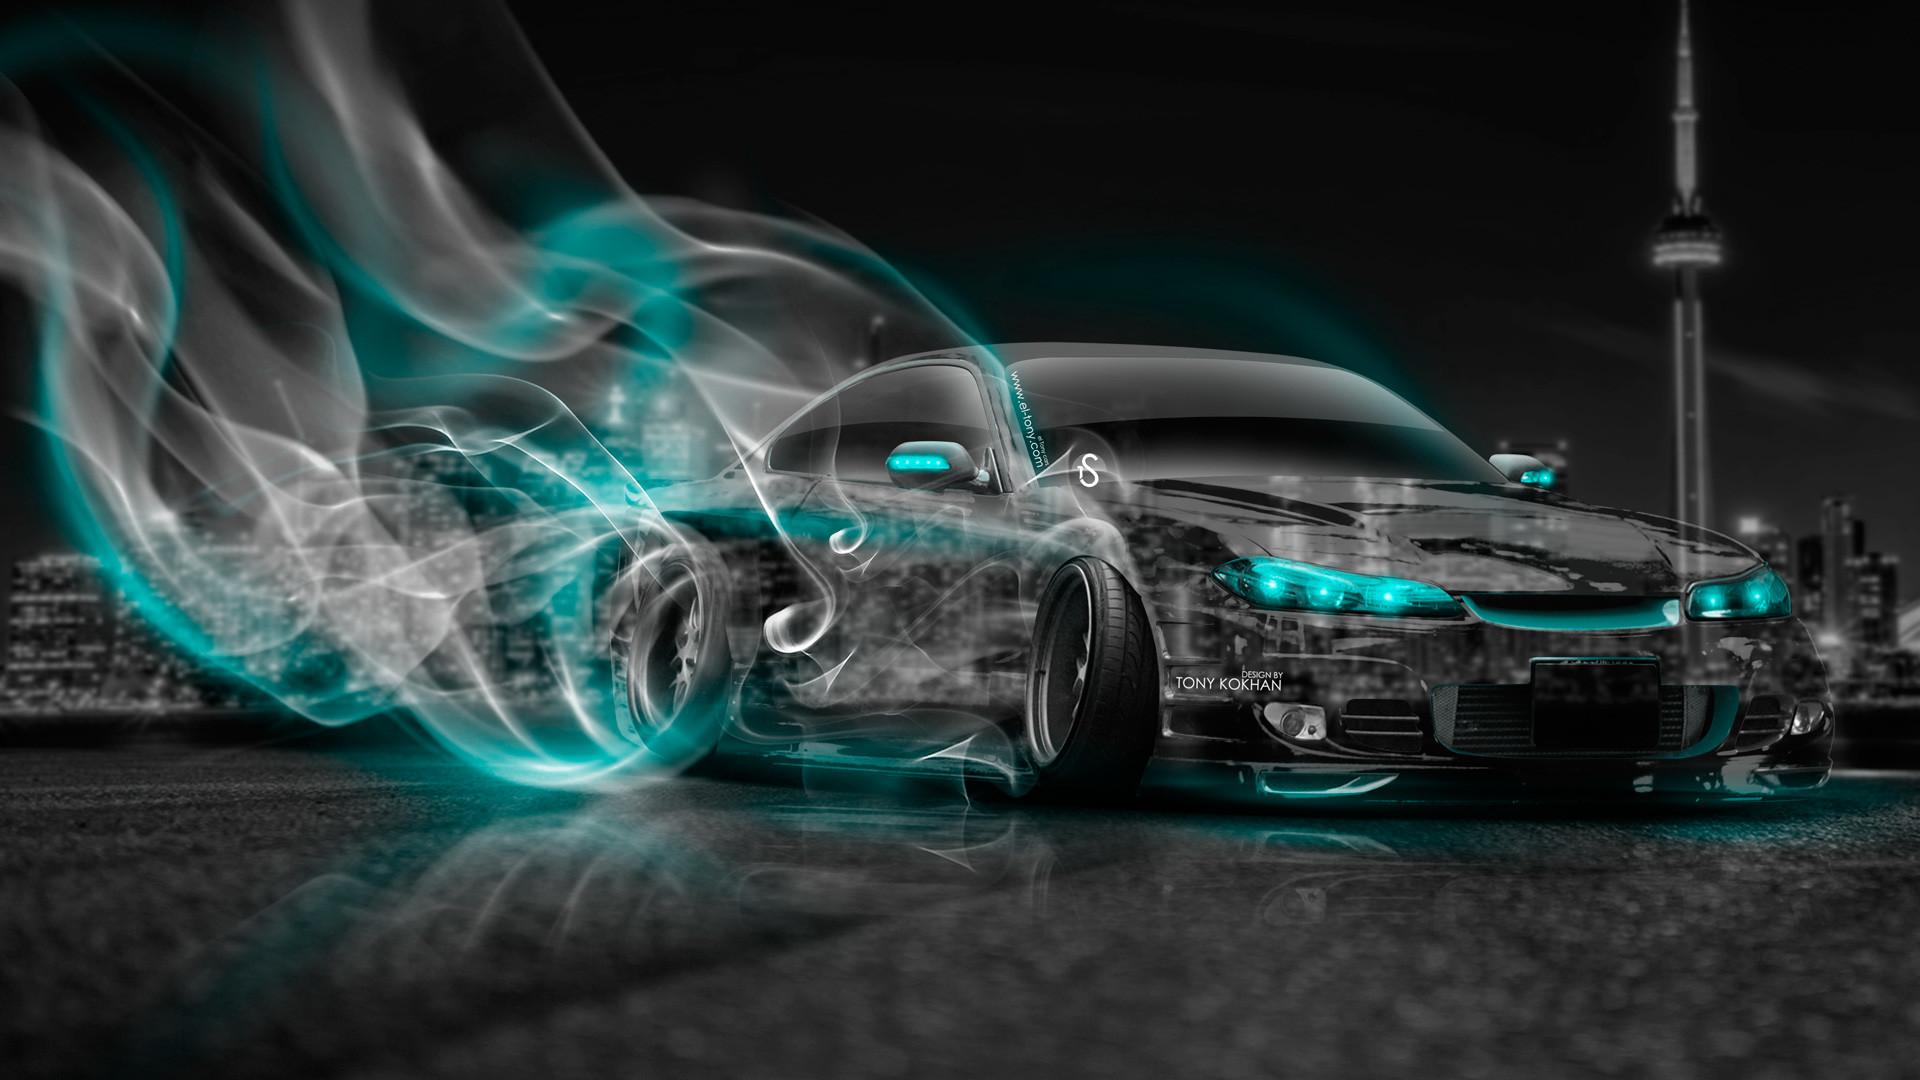 Drifting Cars Wallpaper (76+ images)